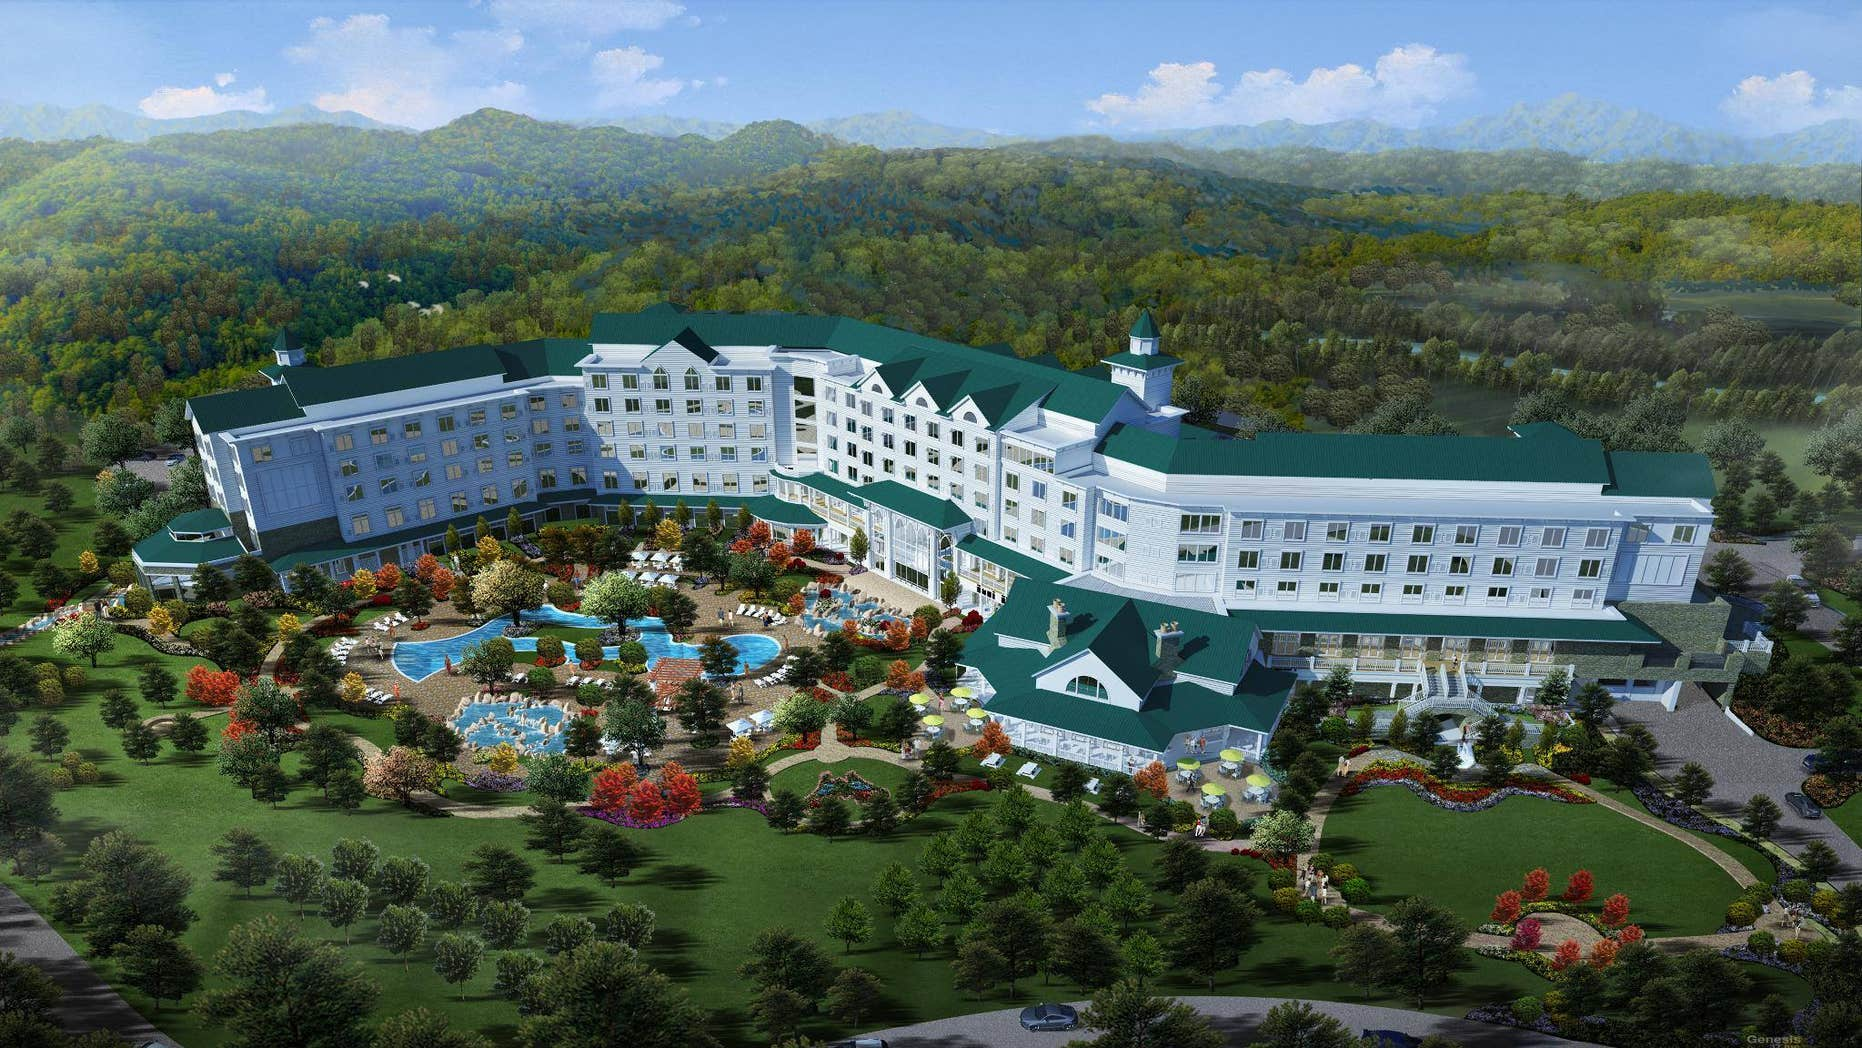 A digital rendering of Dollywood's DreamMore Resort.